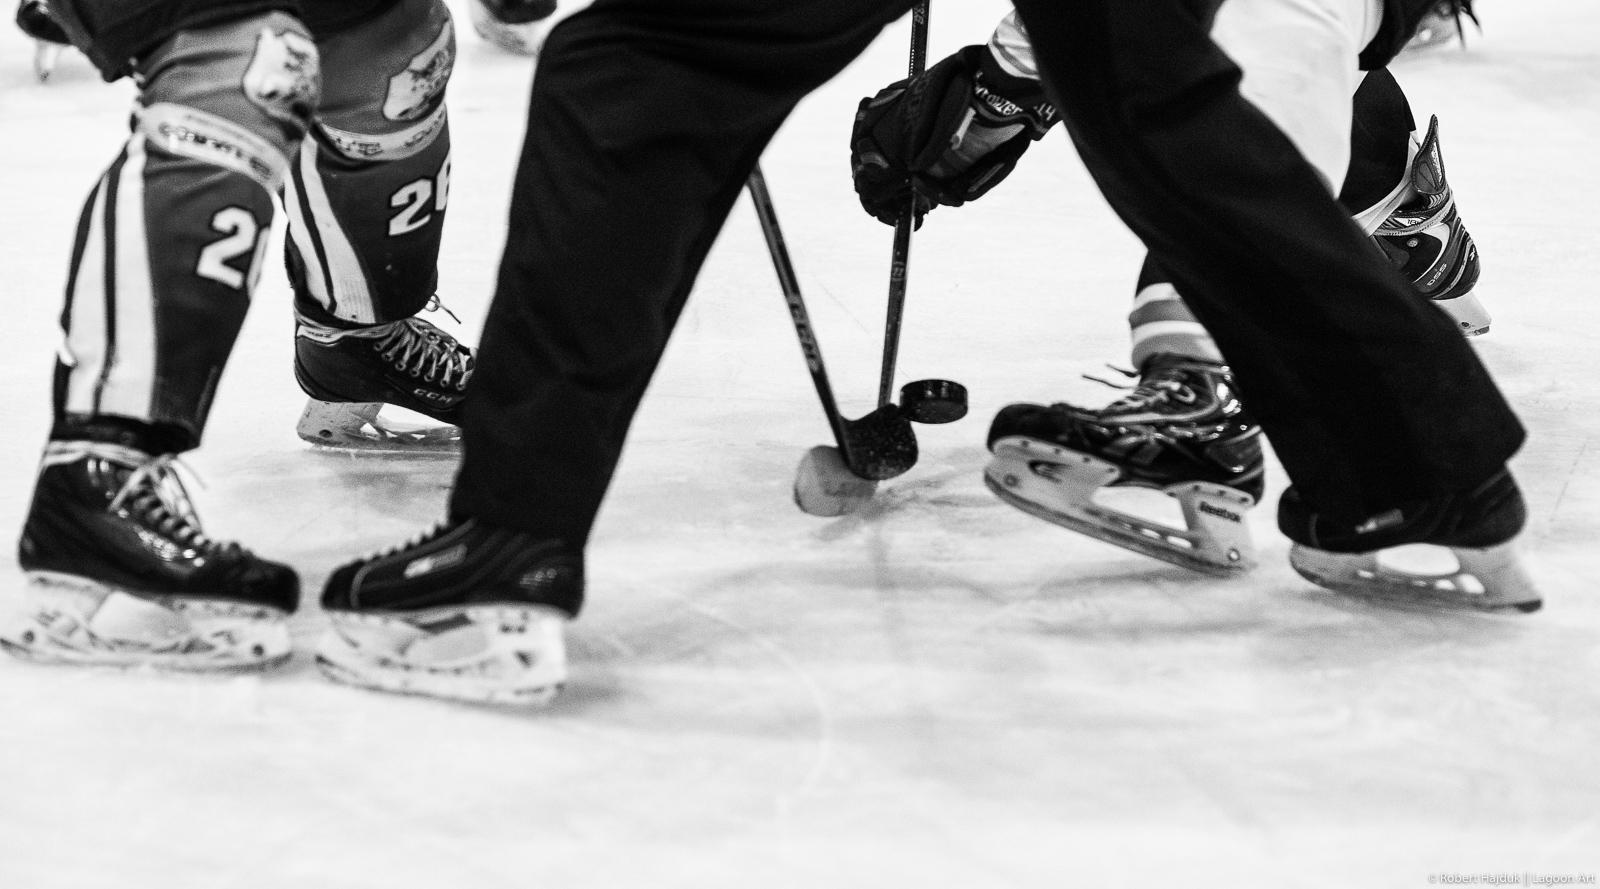 I Liga - MH Automatyka Stoczniowiec 2014 vs UKH Dębica || 2015-11-15, Gdańsk, Hala Olivia, Polska || © Copyright 2015 || Robert Hajduk - Lagoon Art || All Rights Reserved ||